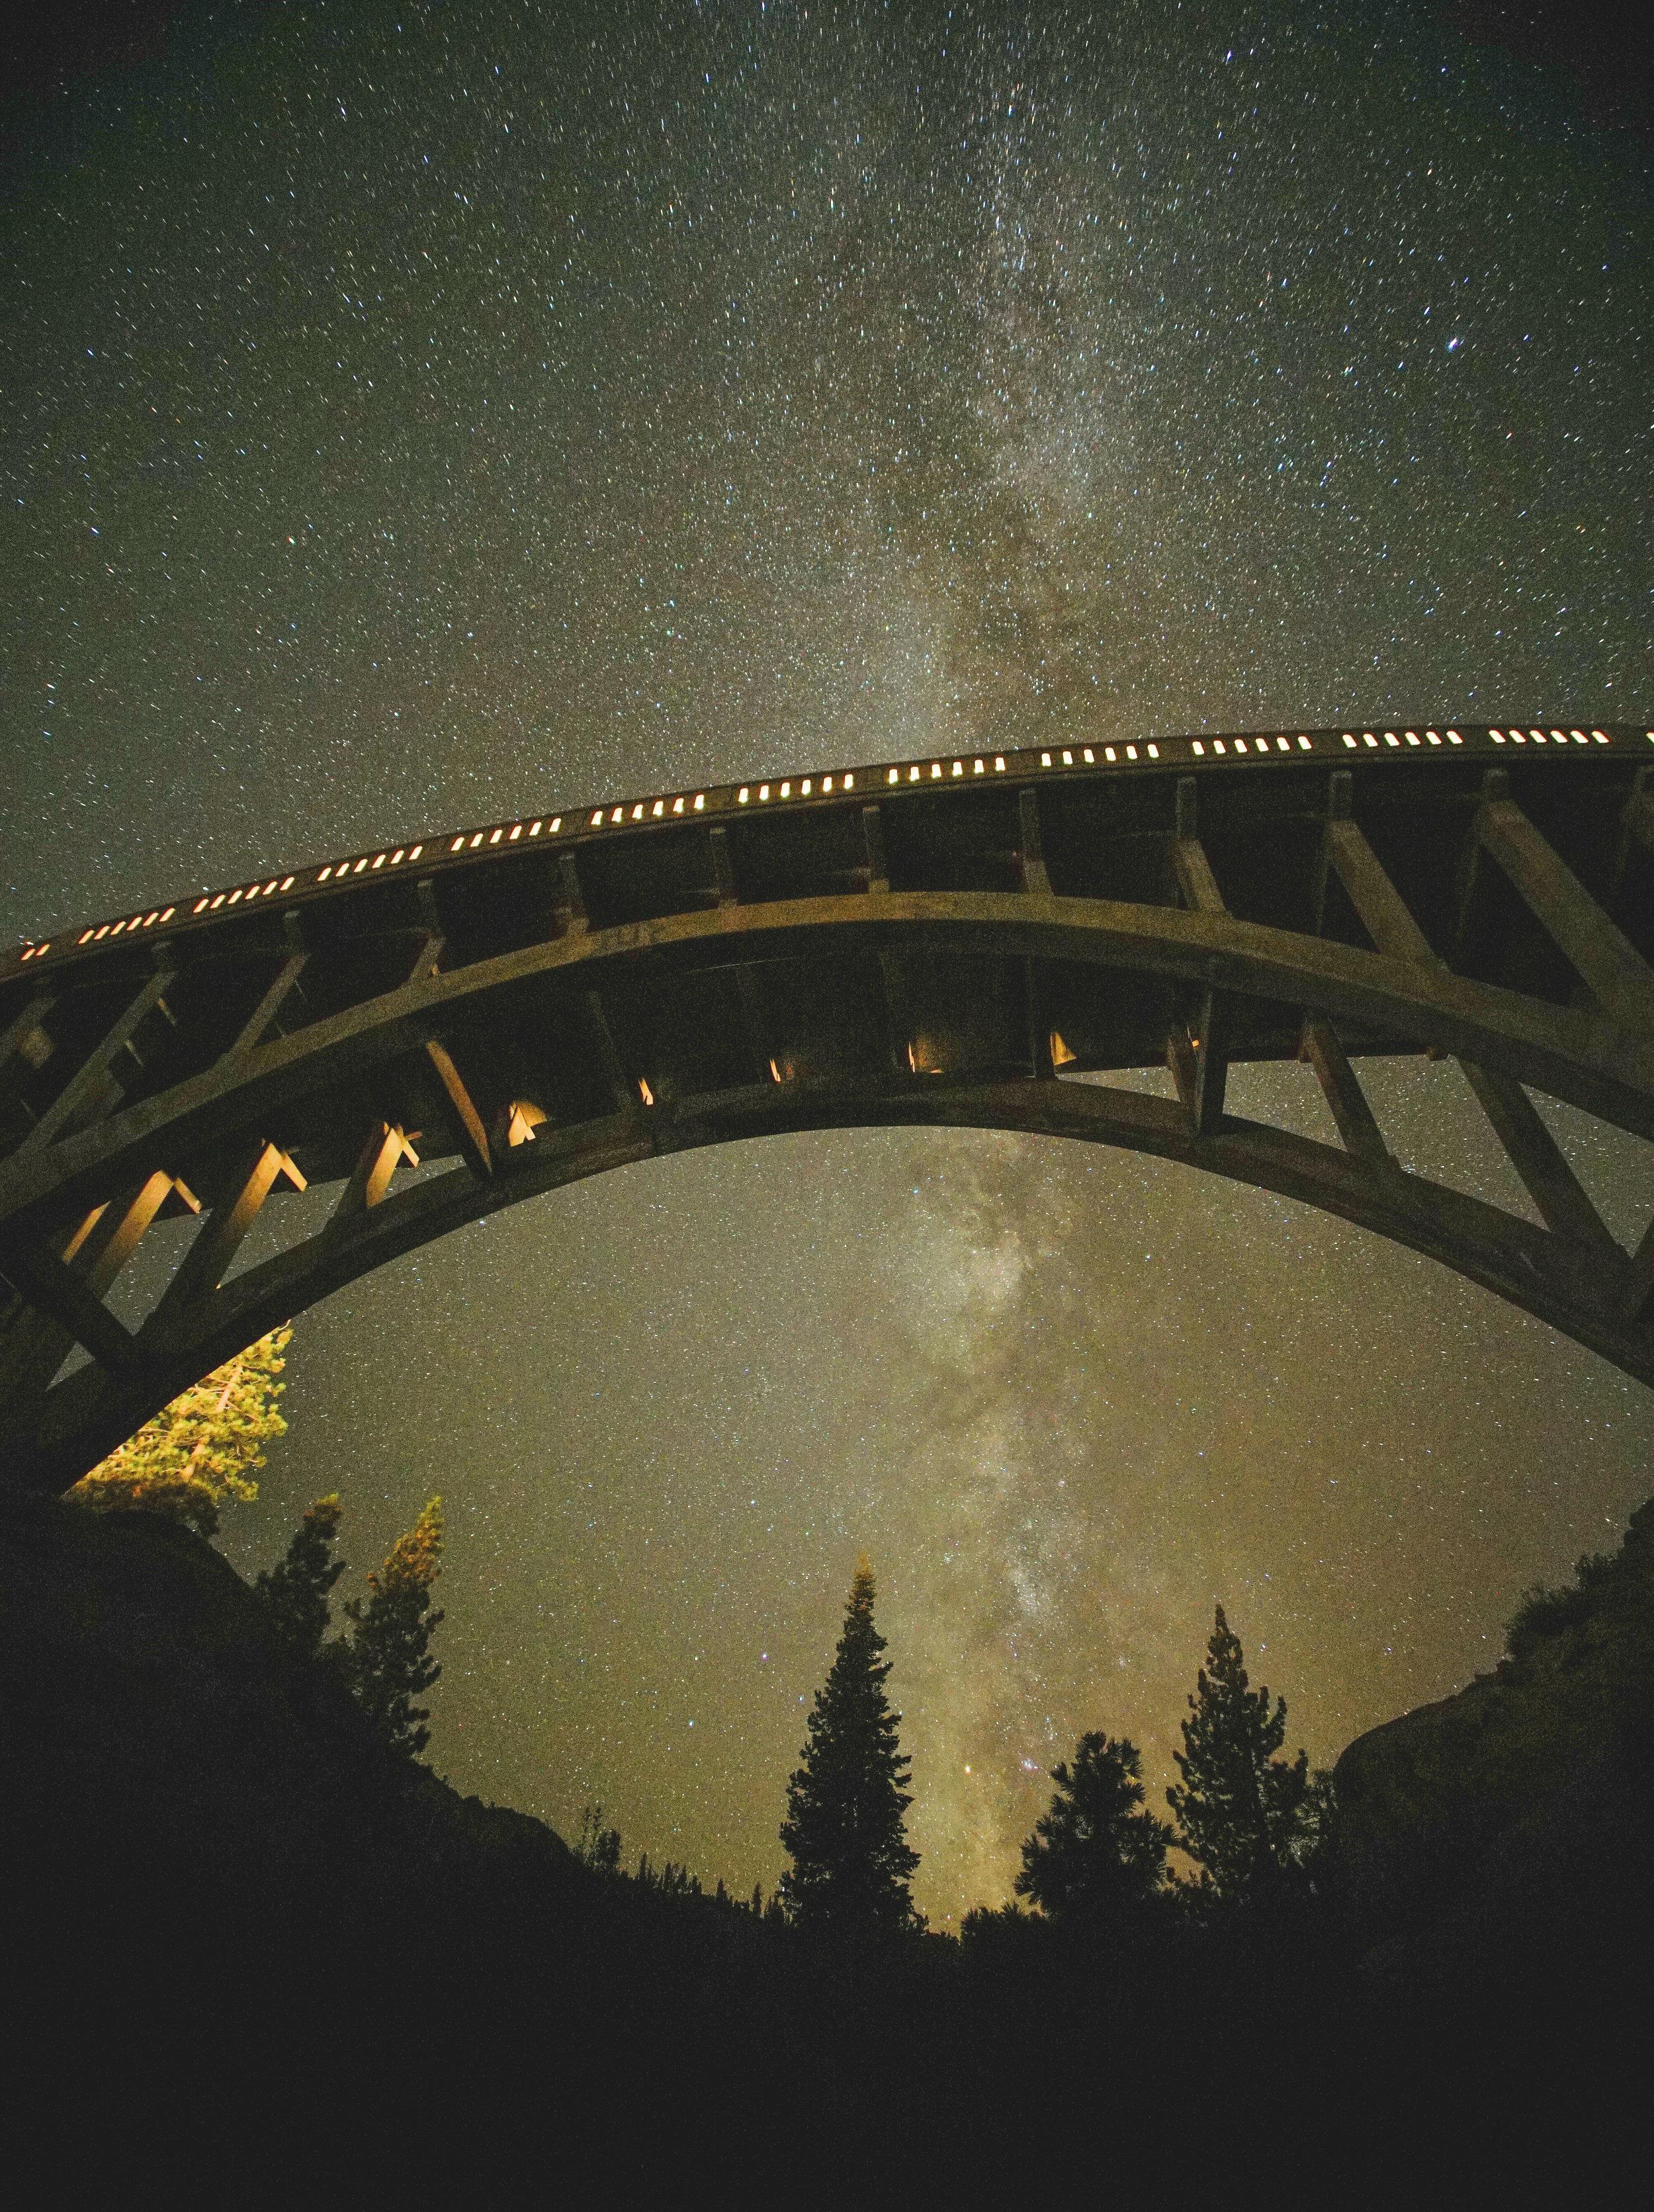 Donnor Bridge [Truckee, CA]